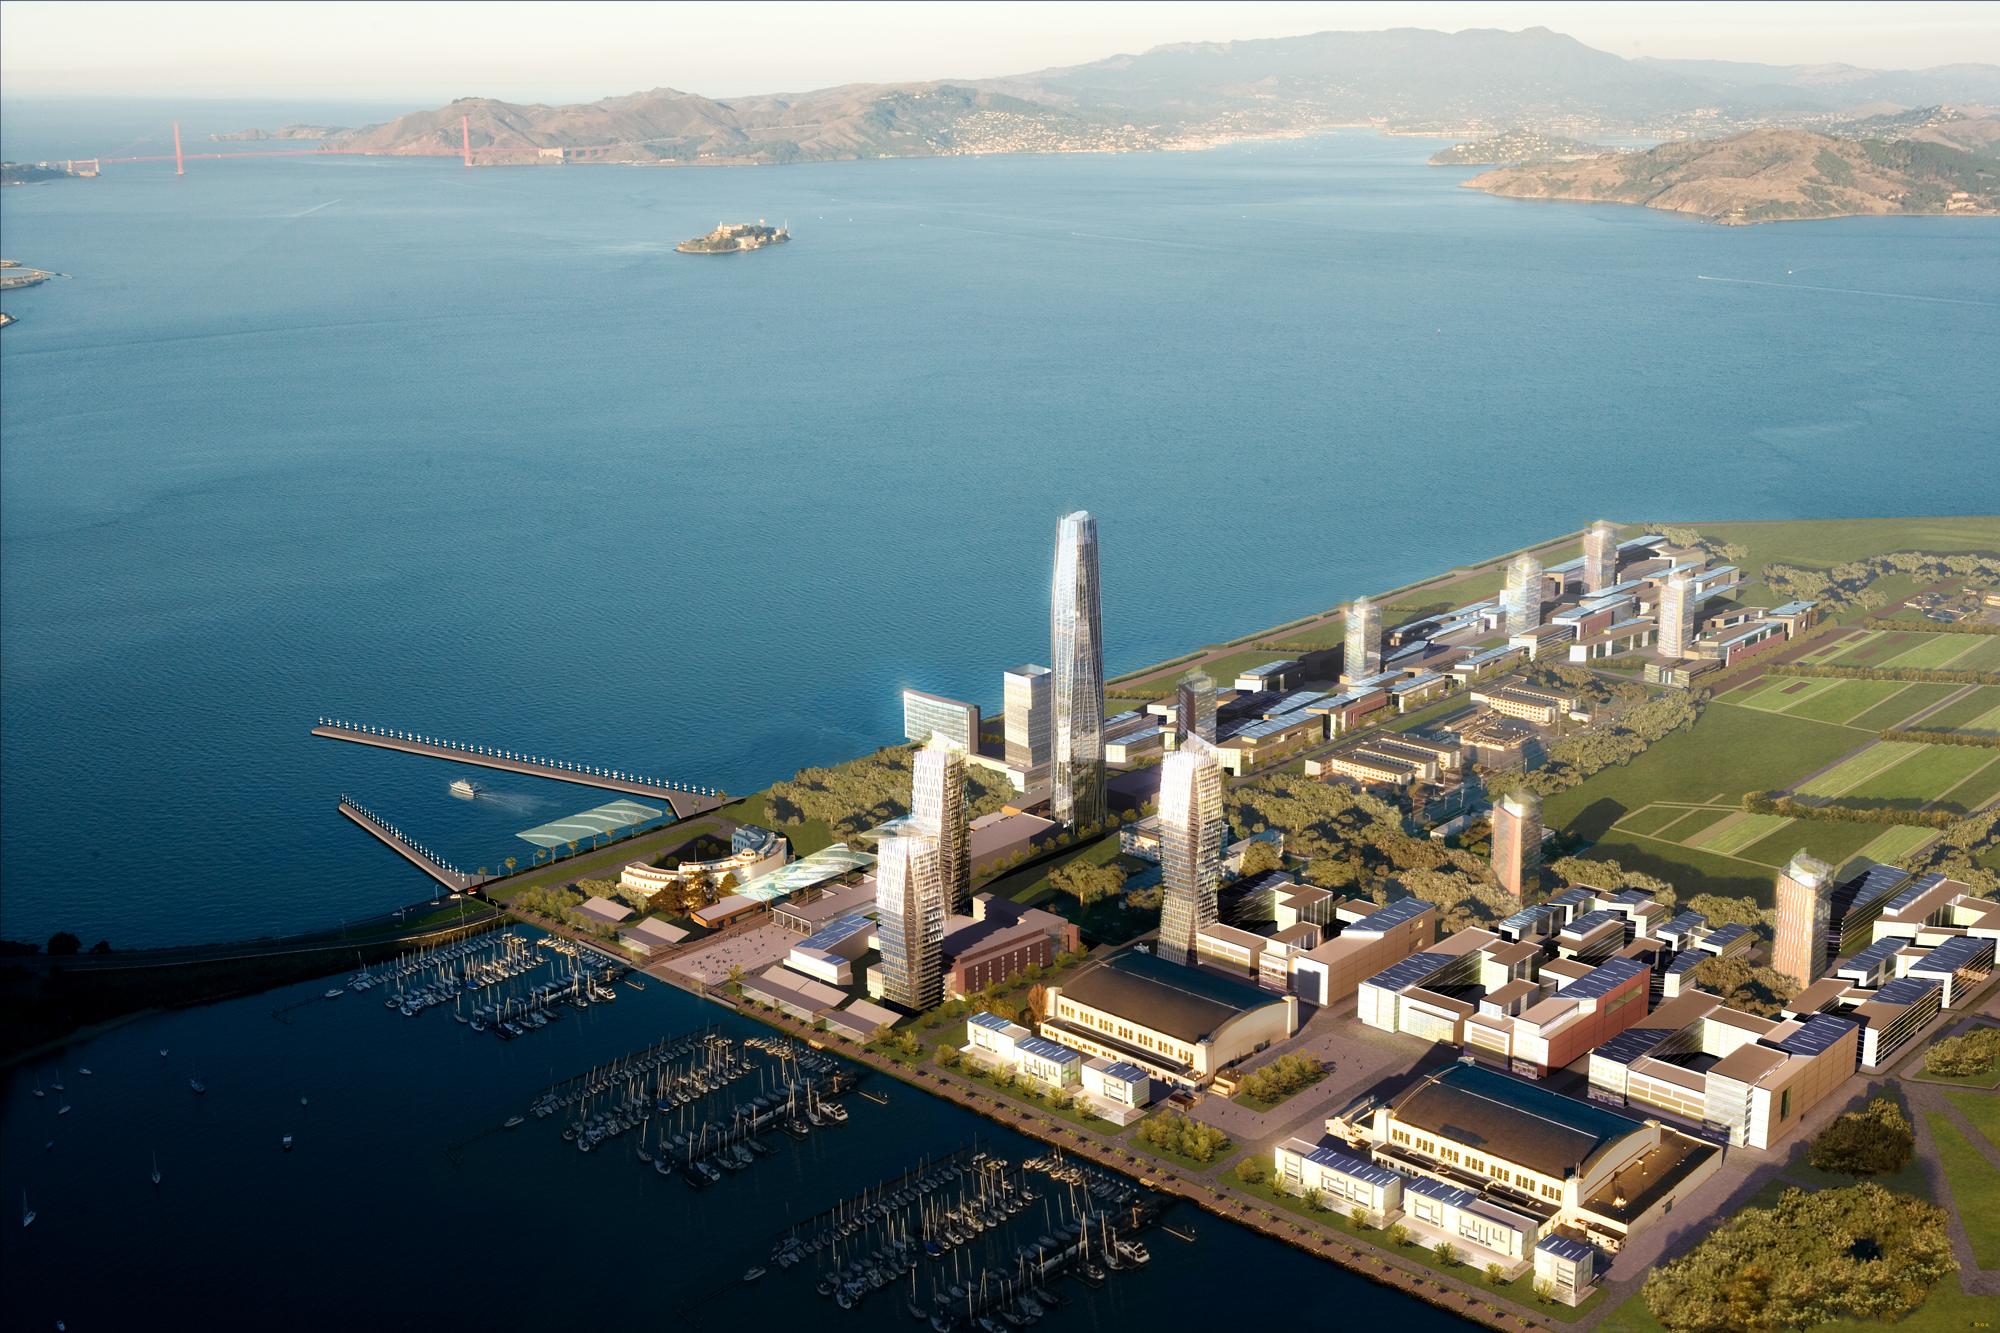 Rendering of Treasure Island, San Francisco